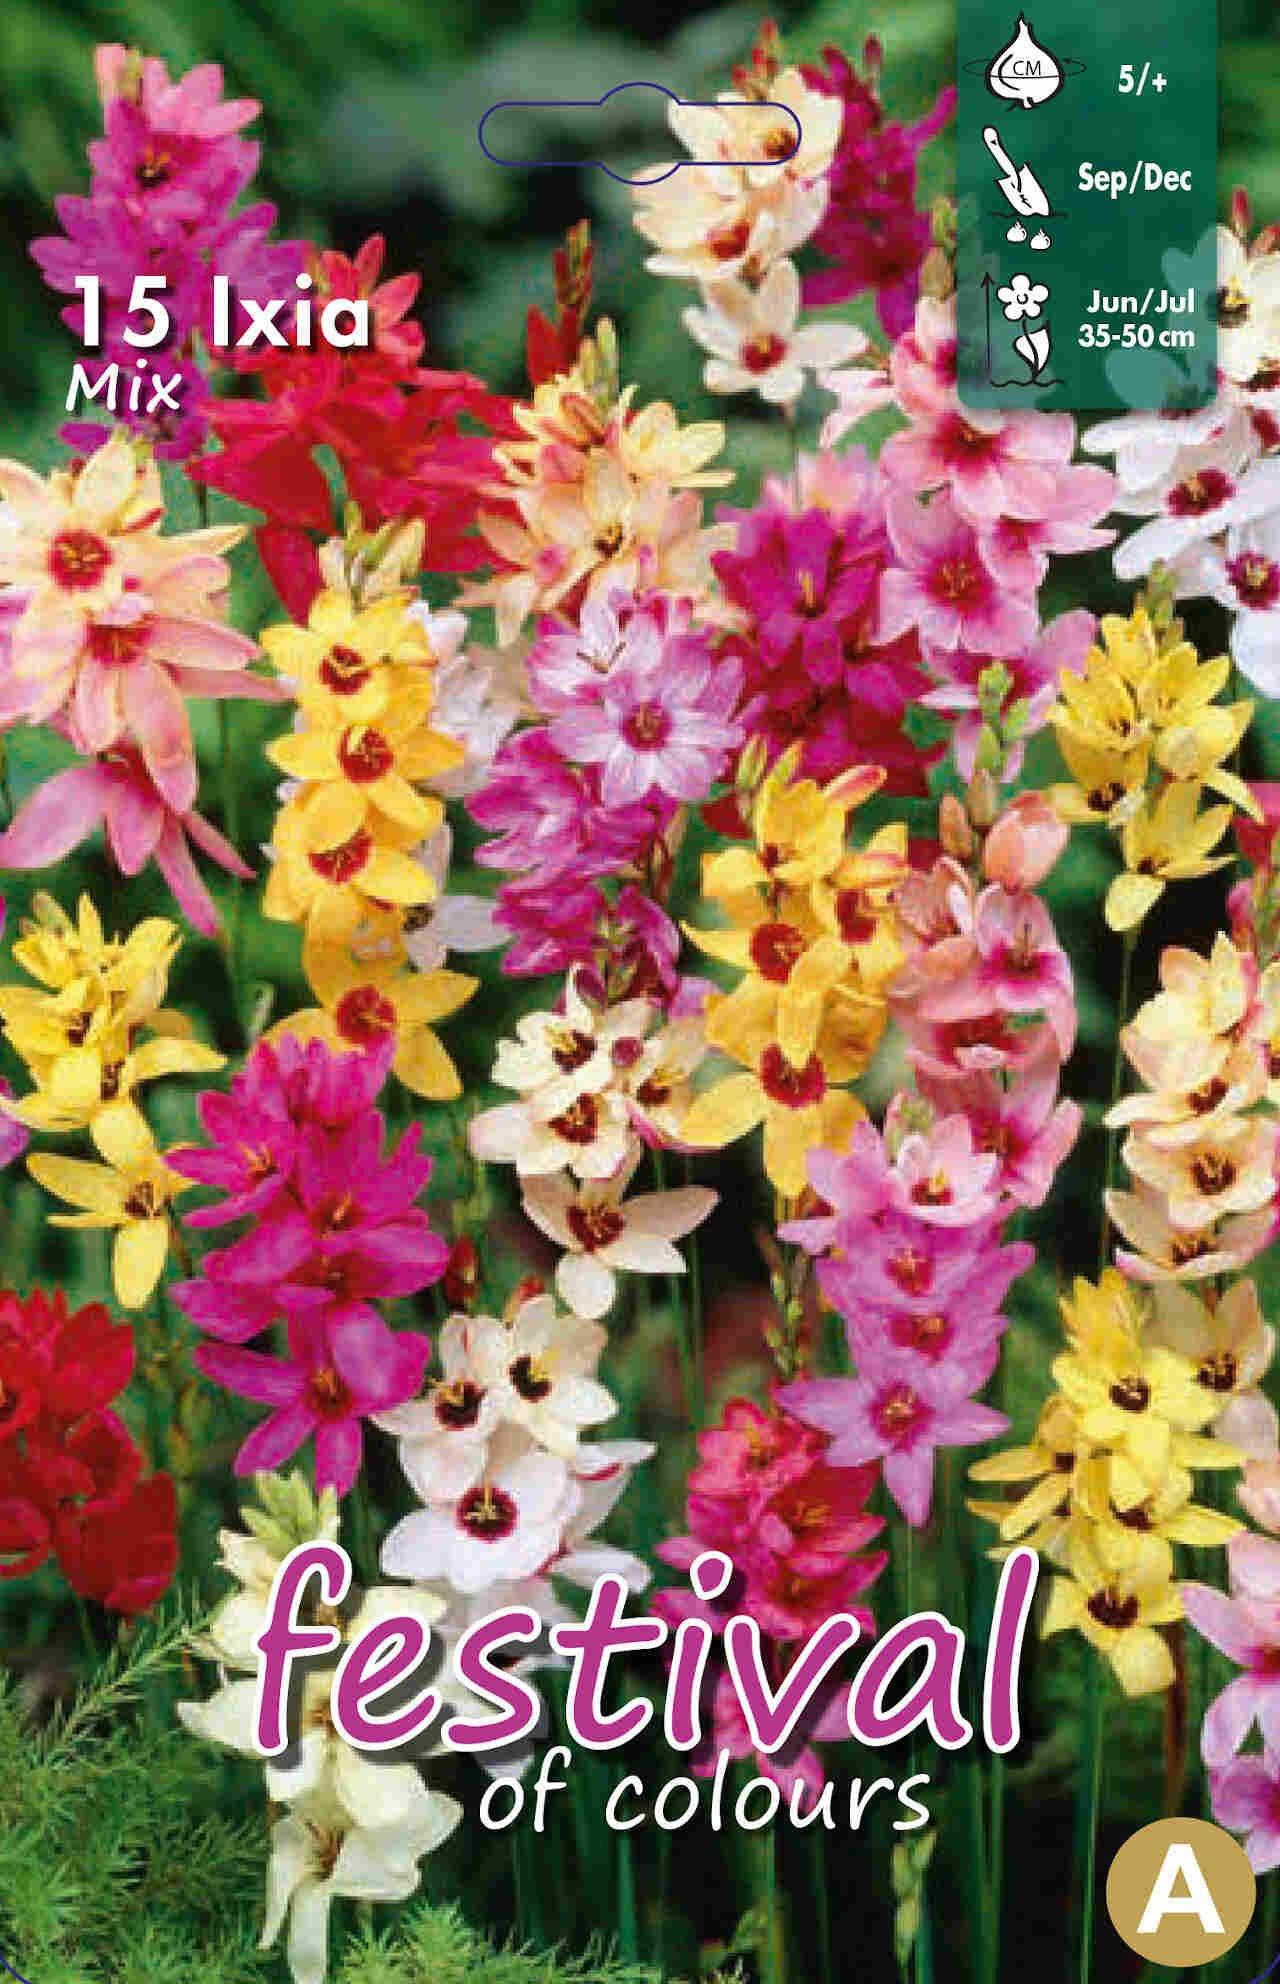 Ixia Mixed 5/+